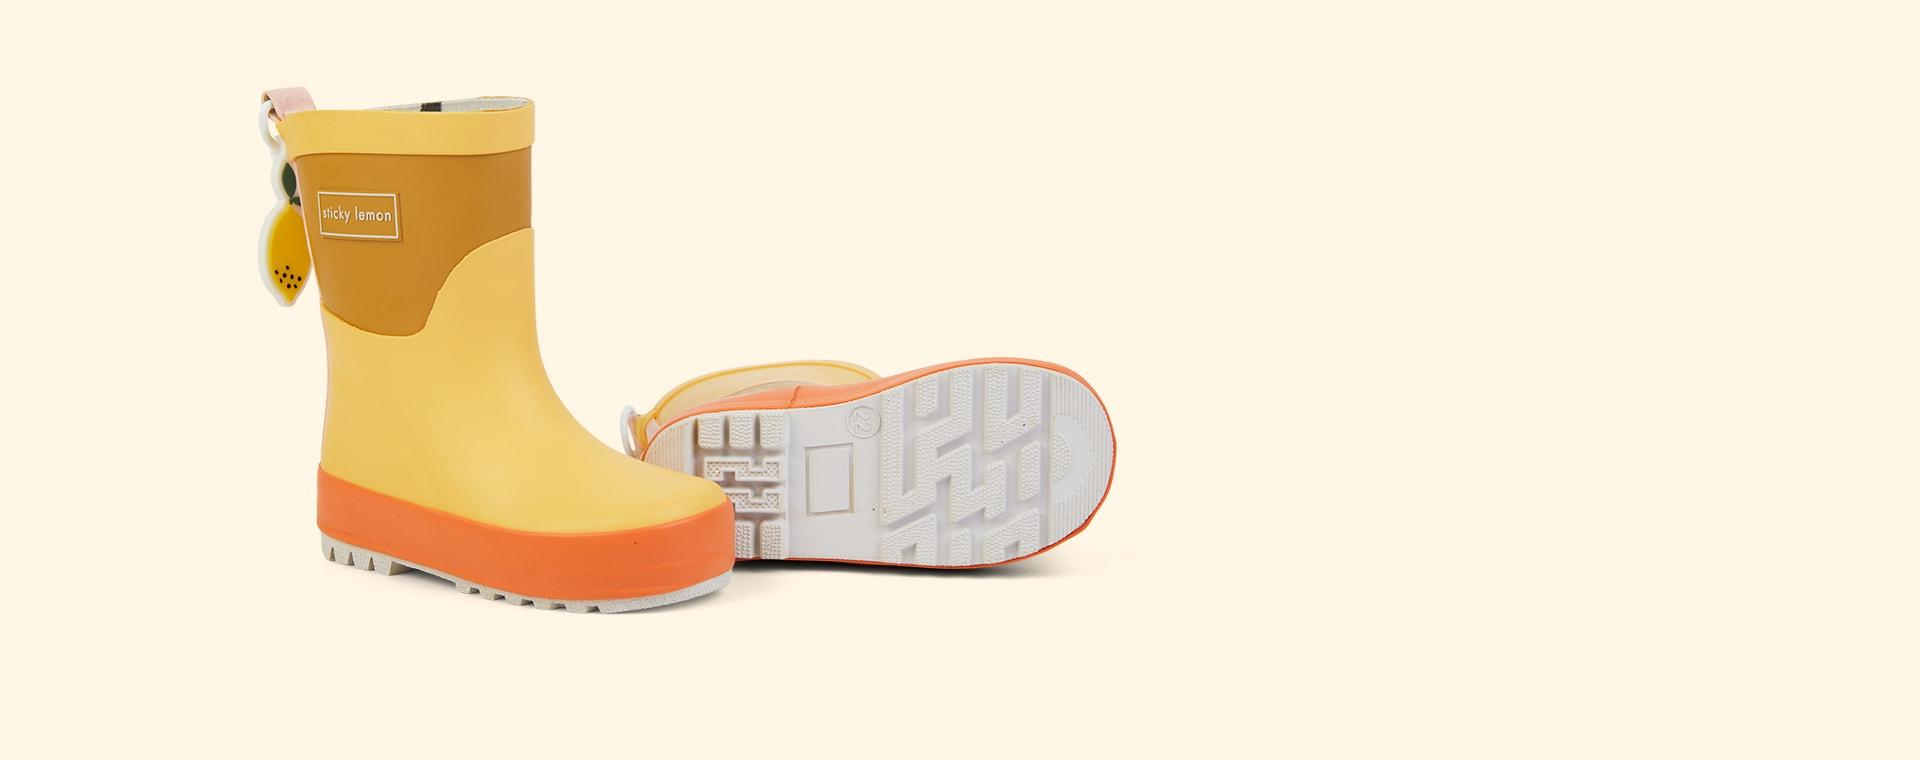 Retro Yellow and Caramel Fudge Sticky Lemon Three Tones Rainboot